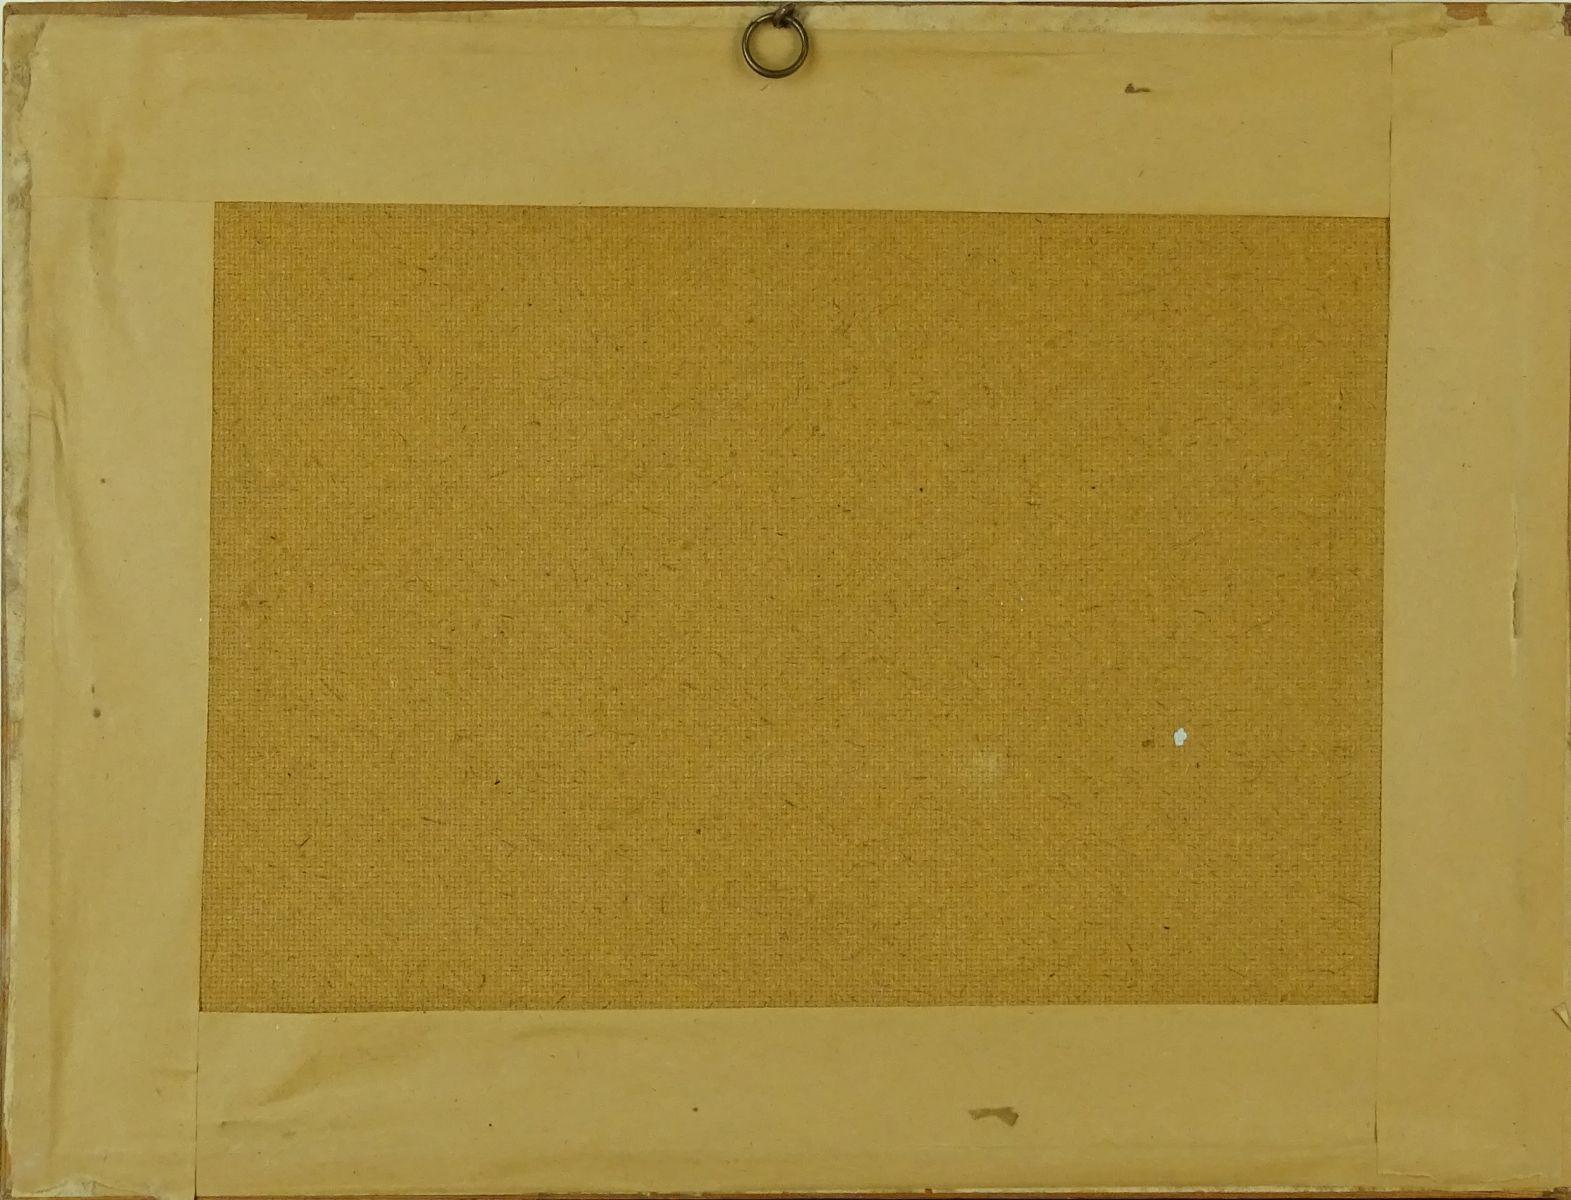 DSC04190.JPG (1571×1200)